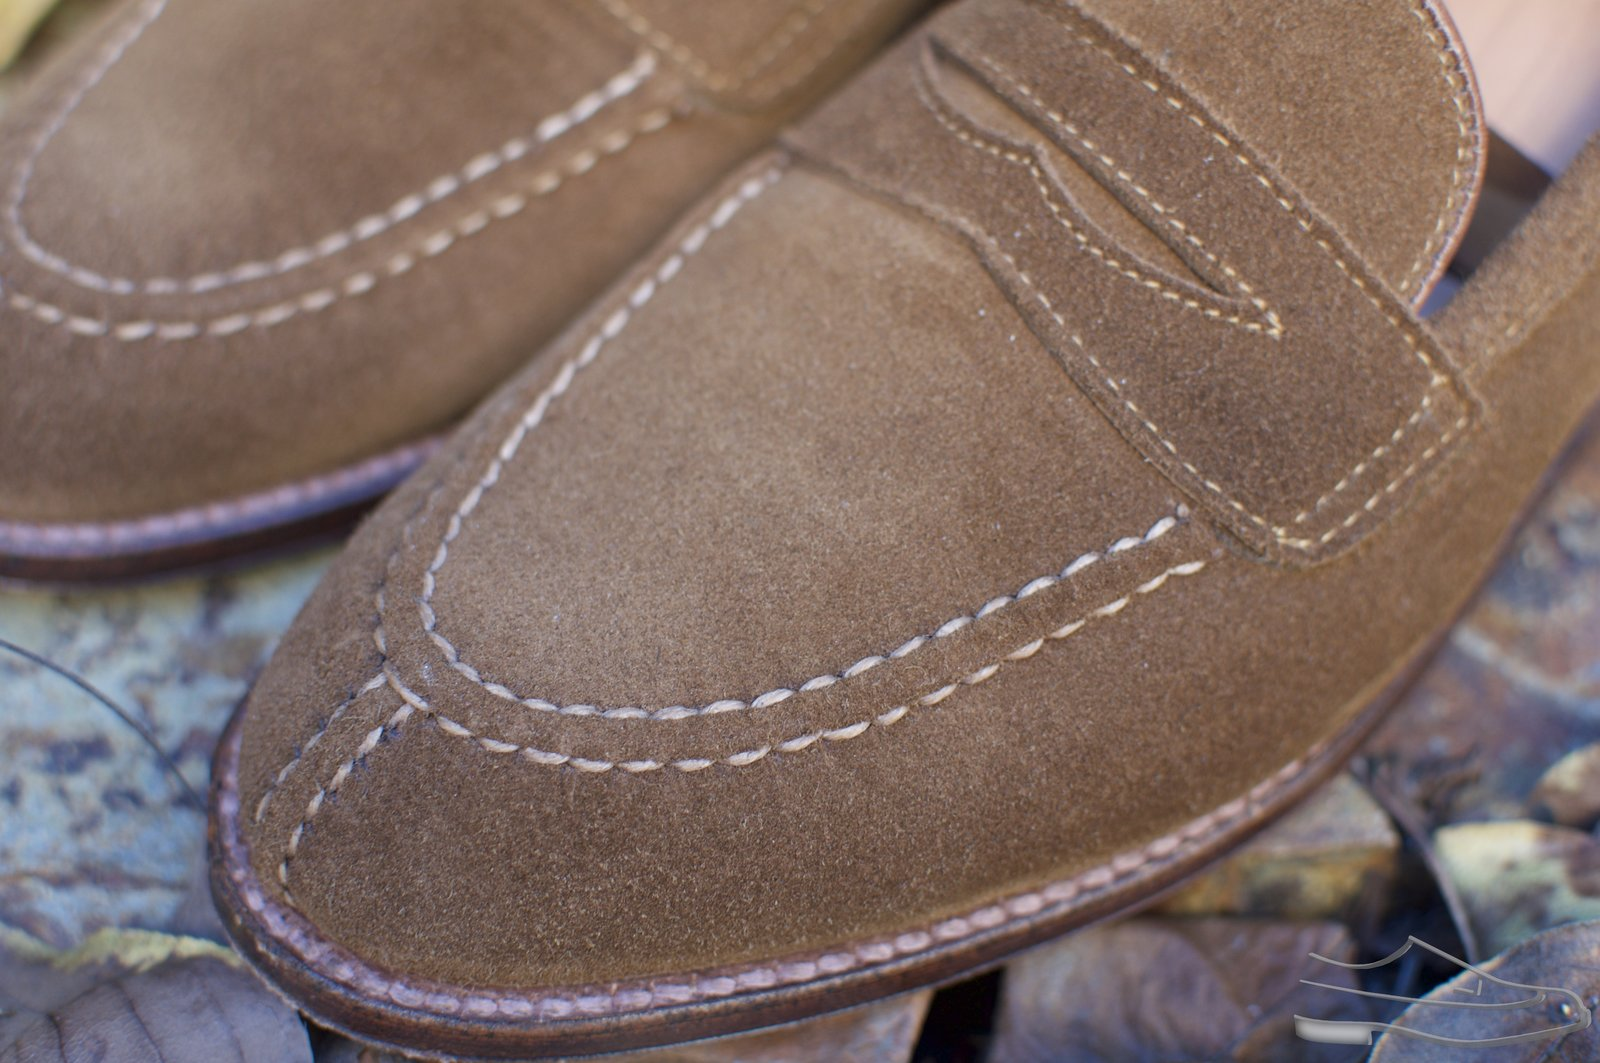 Alden Snuff Suede NST Loafers - 2020-12-03 - 3.jpg